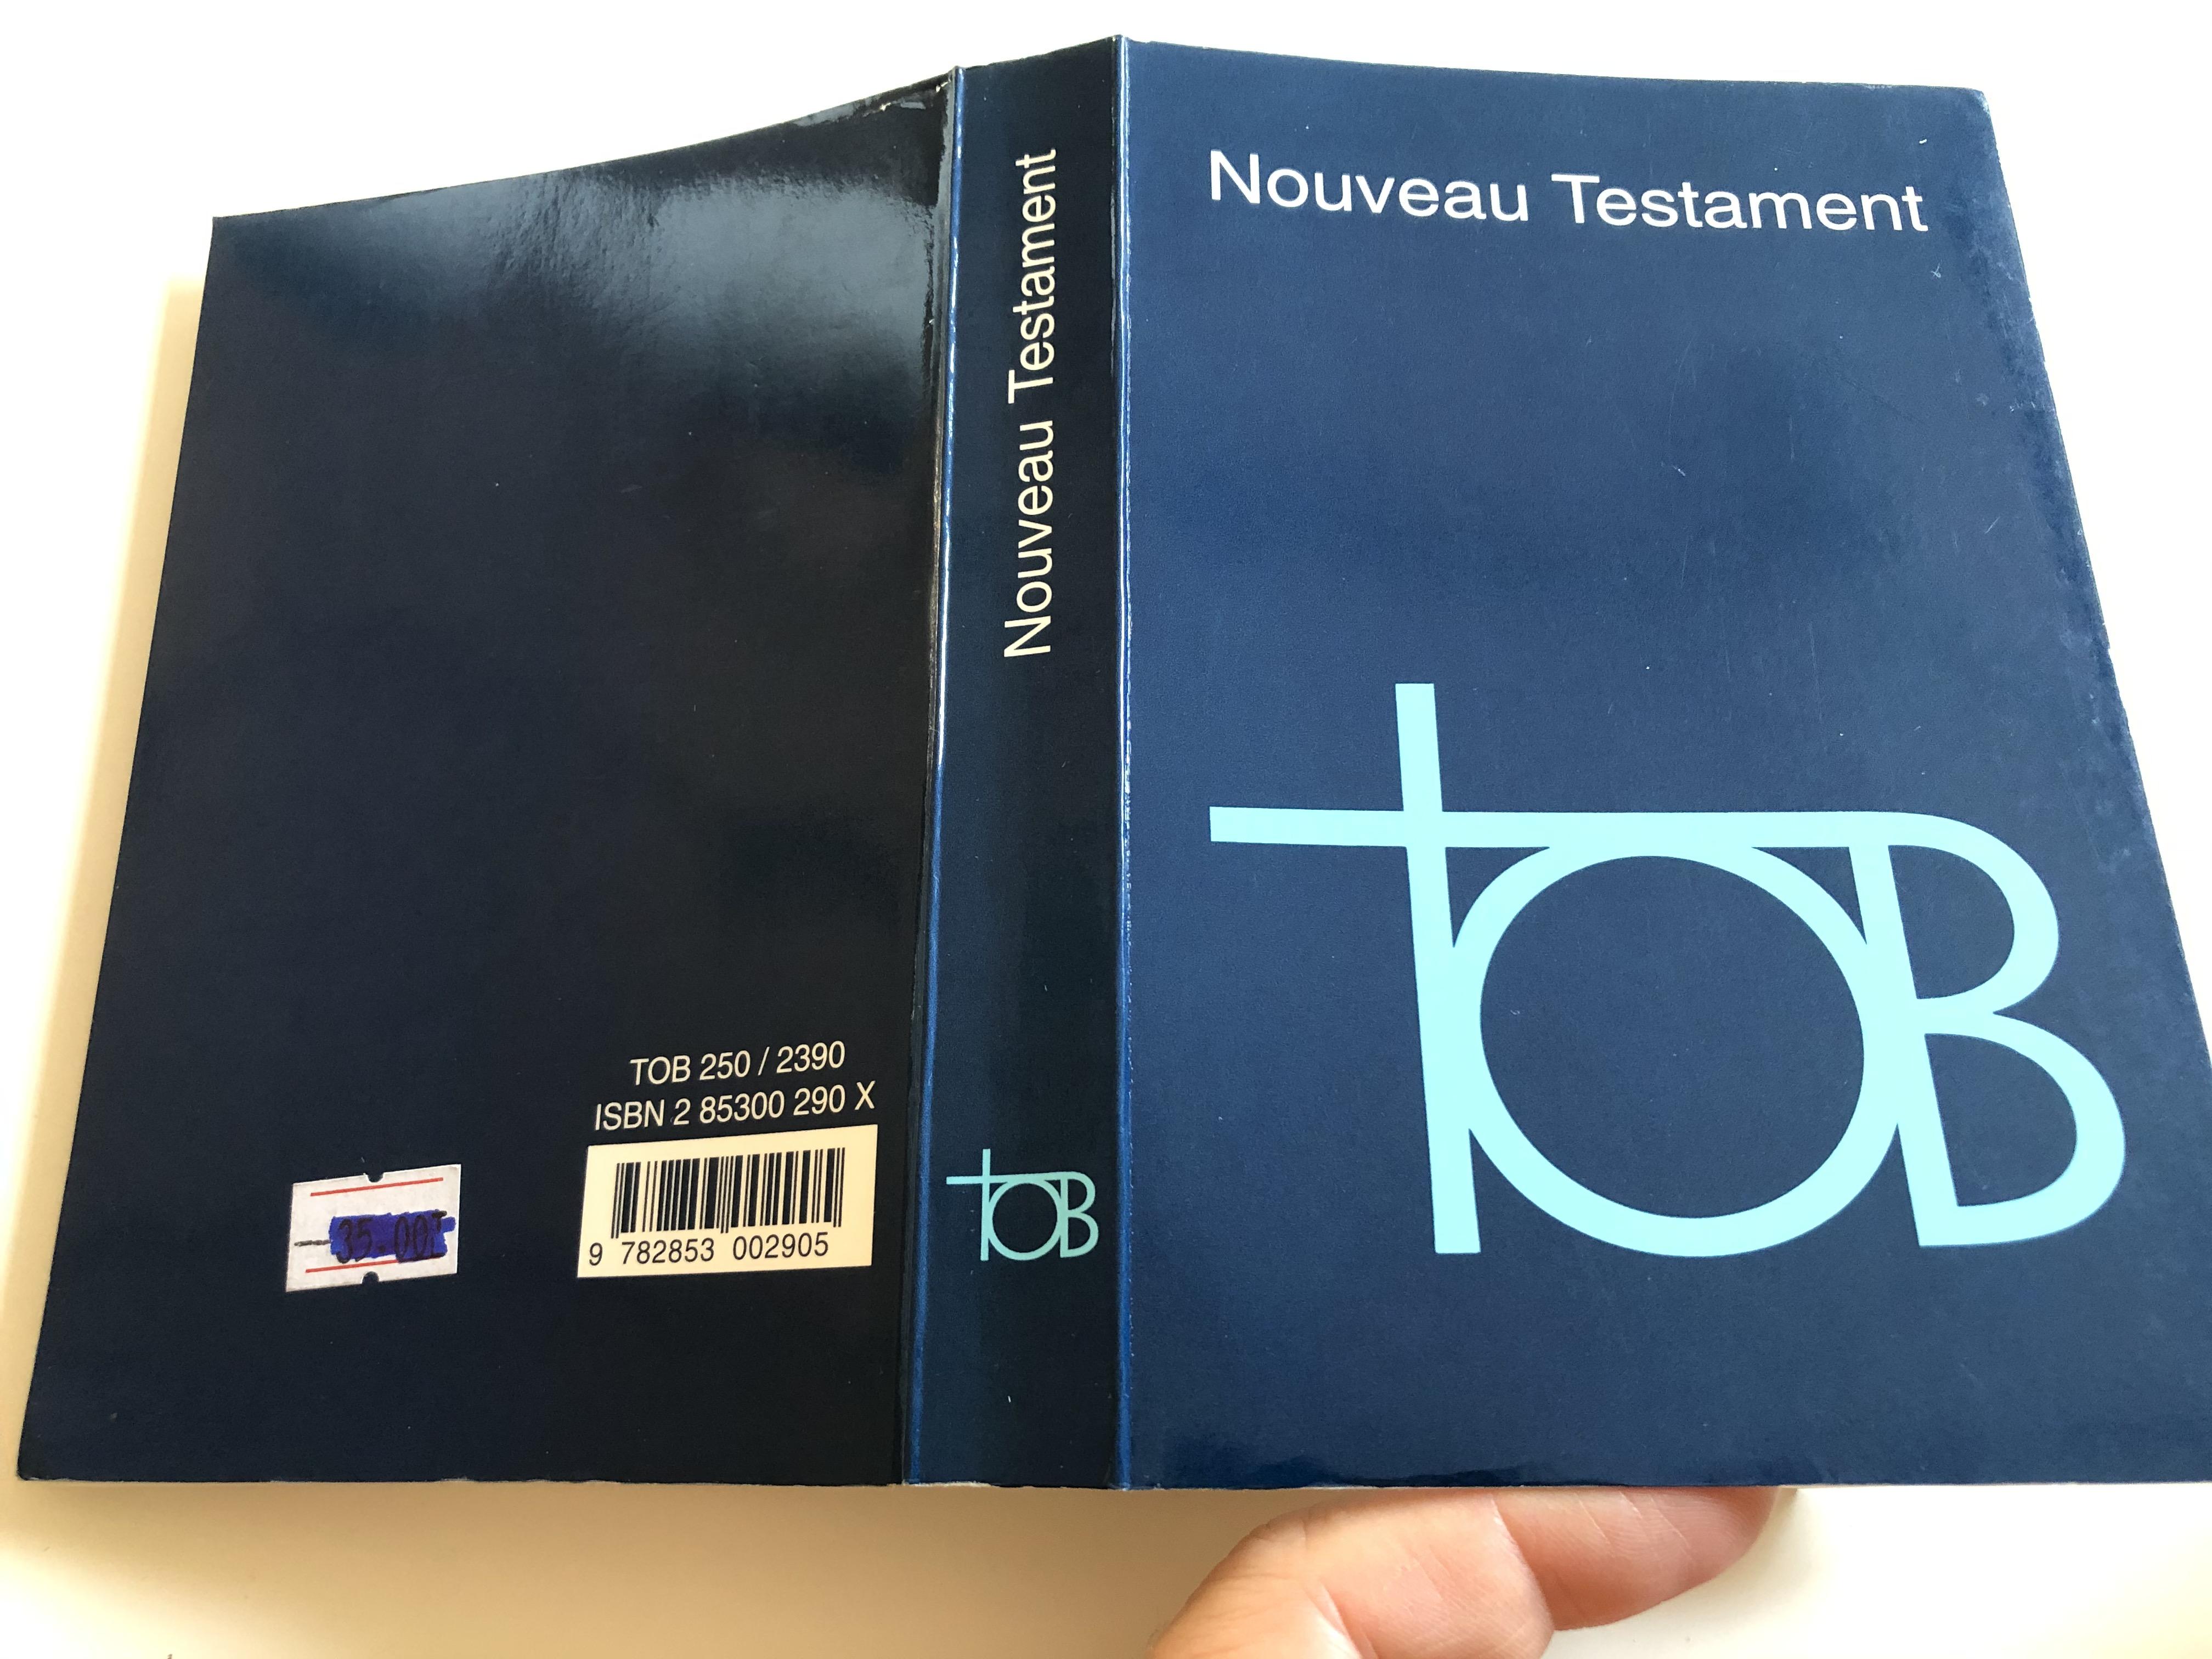 -nouveau-testament-french-language-tob-new-testament-paperback-14.jpg